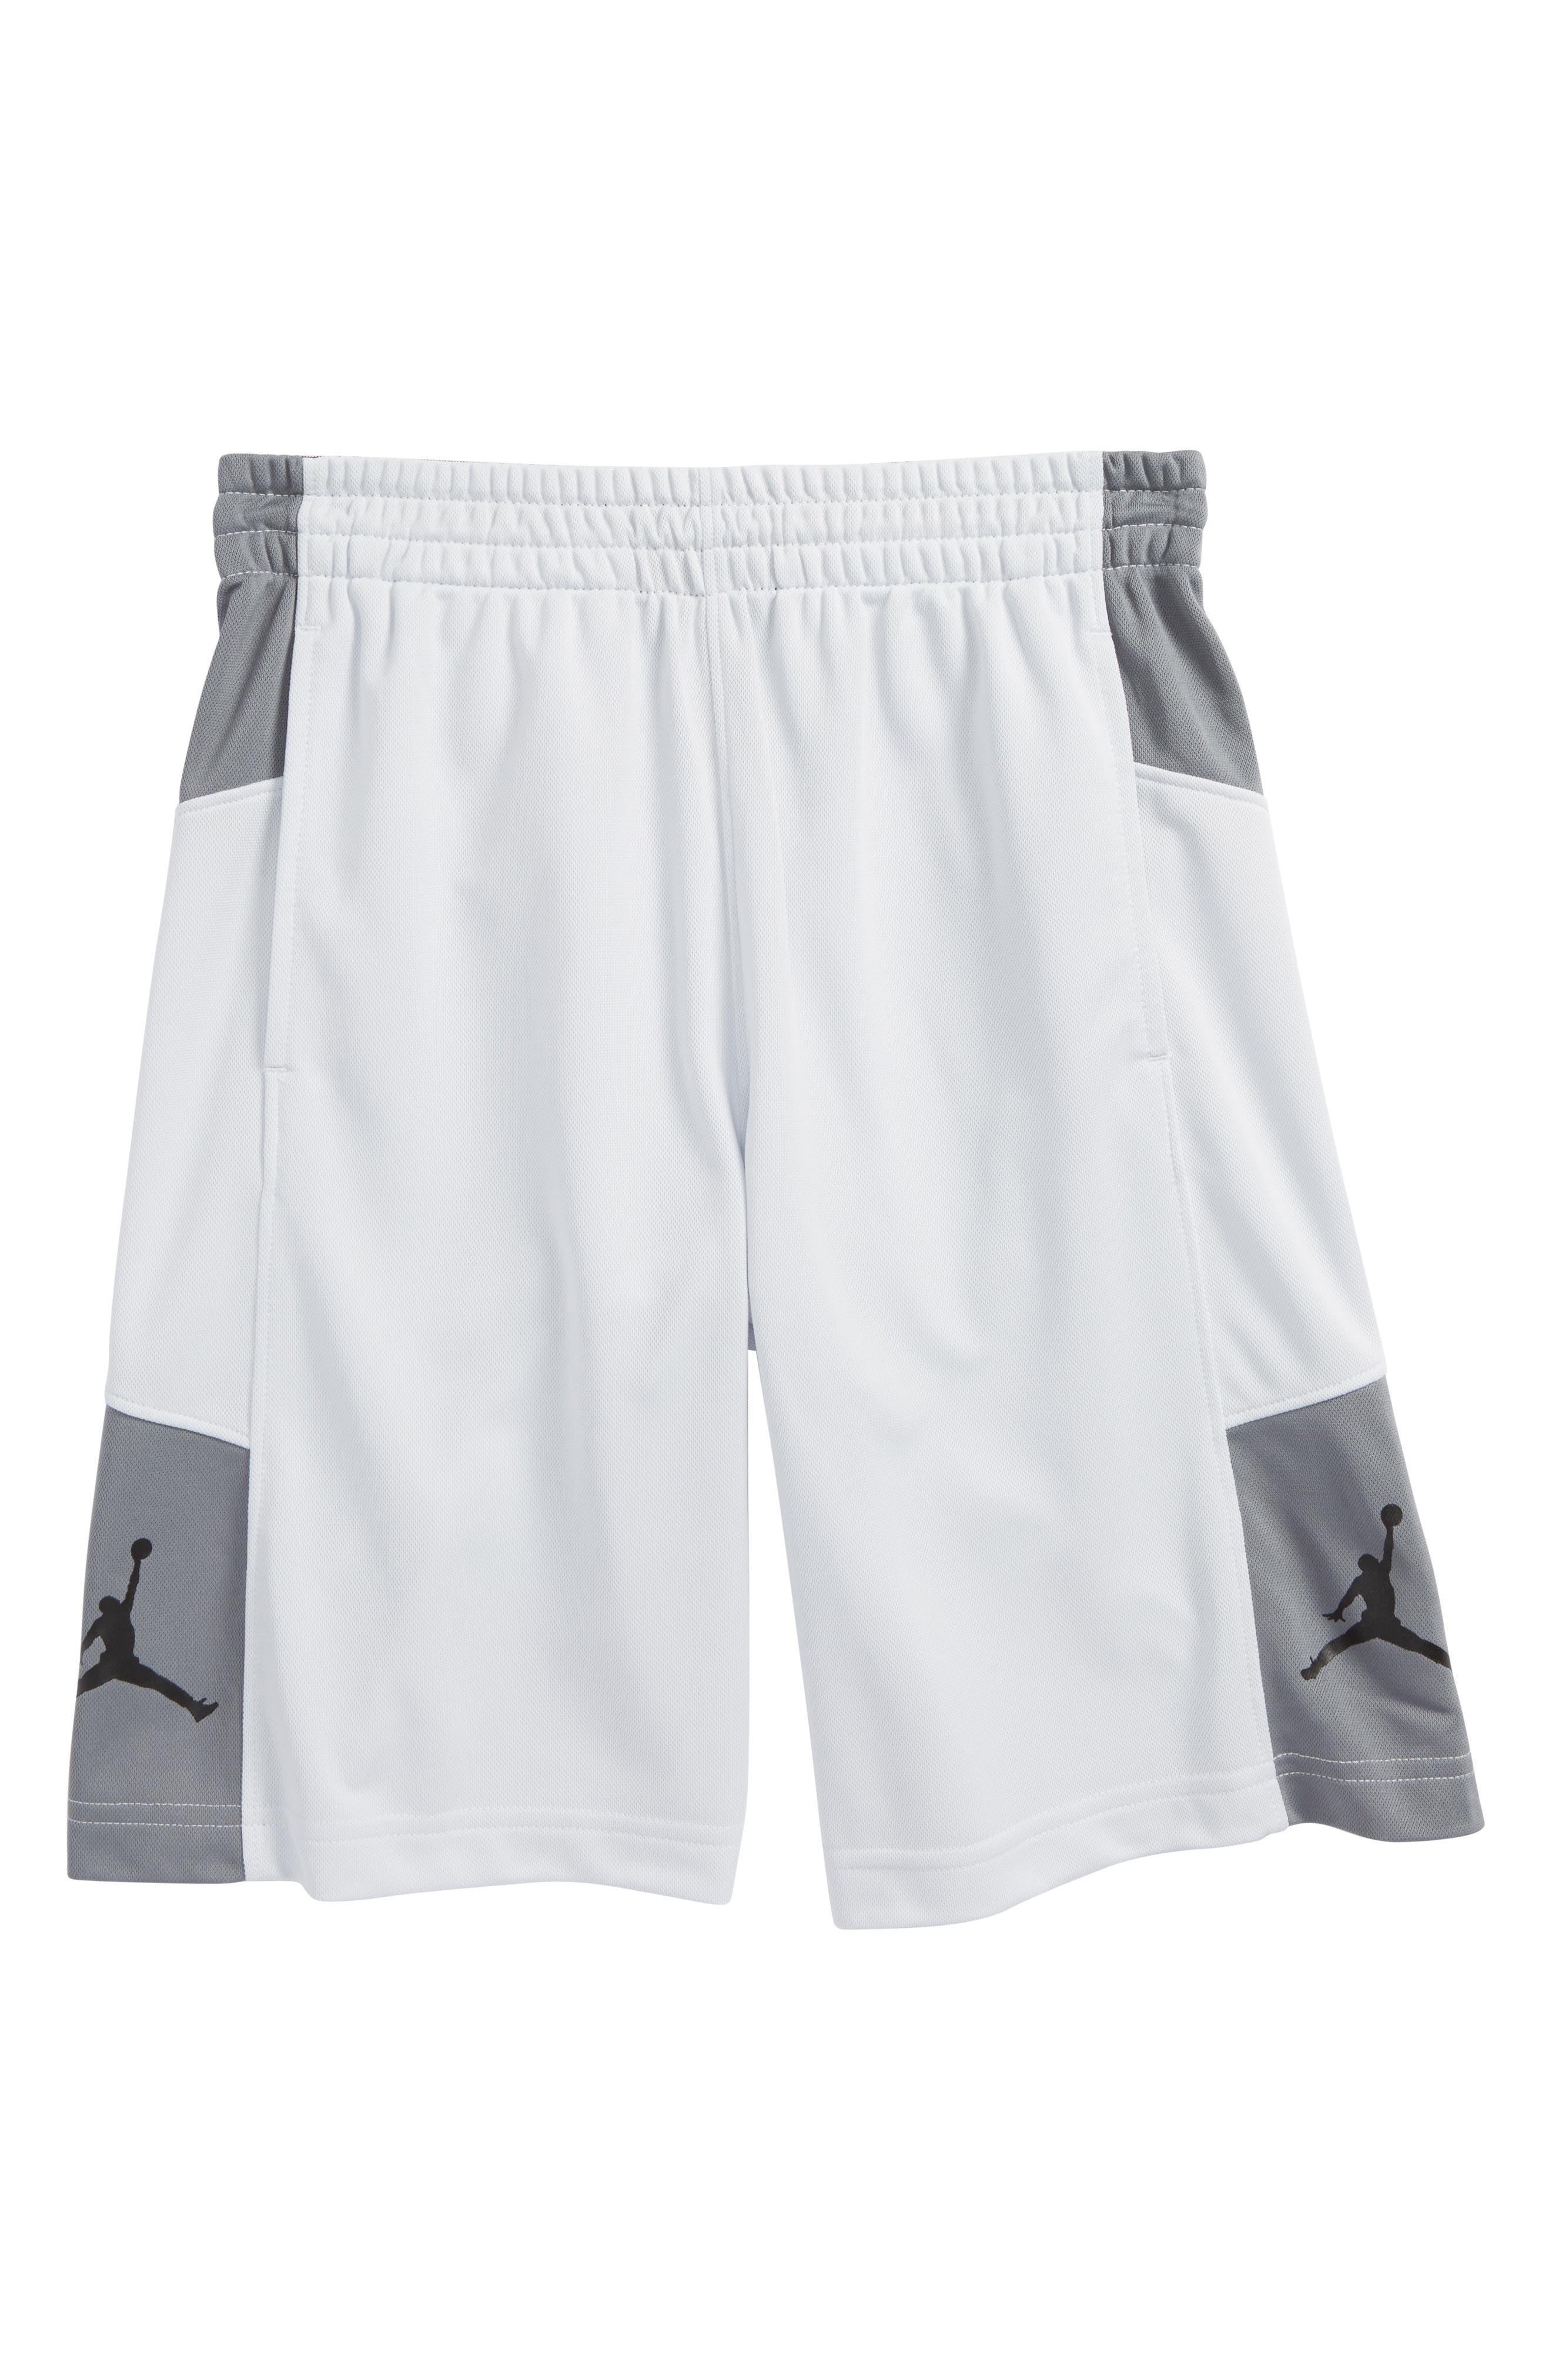 Jordan Elevate Shorts,                             Main thumbnail 1, color,                             Pure Platinum